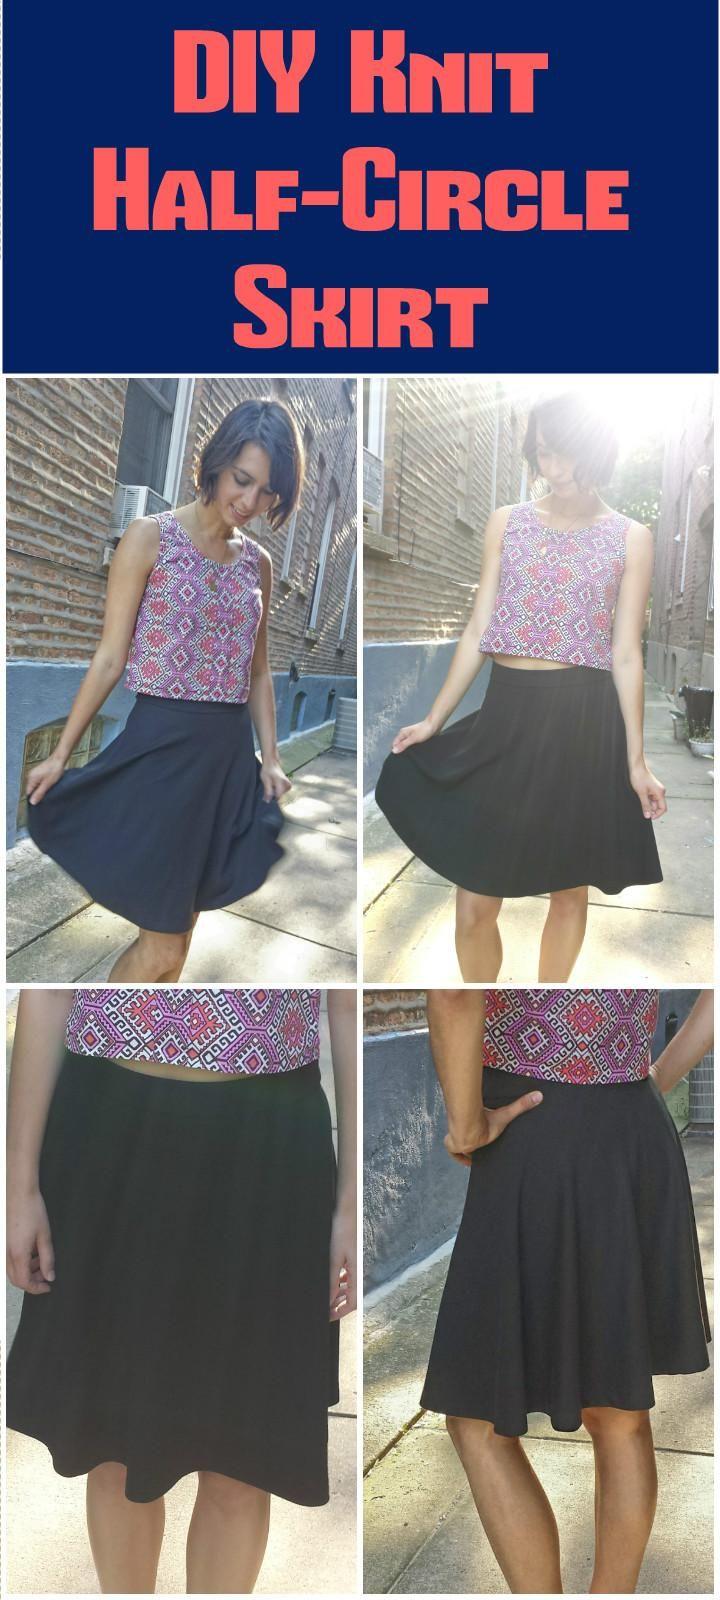 25 diy half circle skirt patterns free sewing patterns circle 25 diy half circle skirt patterns free sewing patterns bankloansurffo Image collections